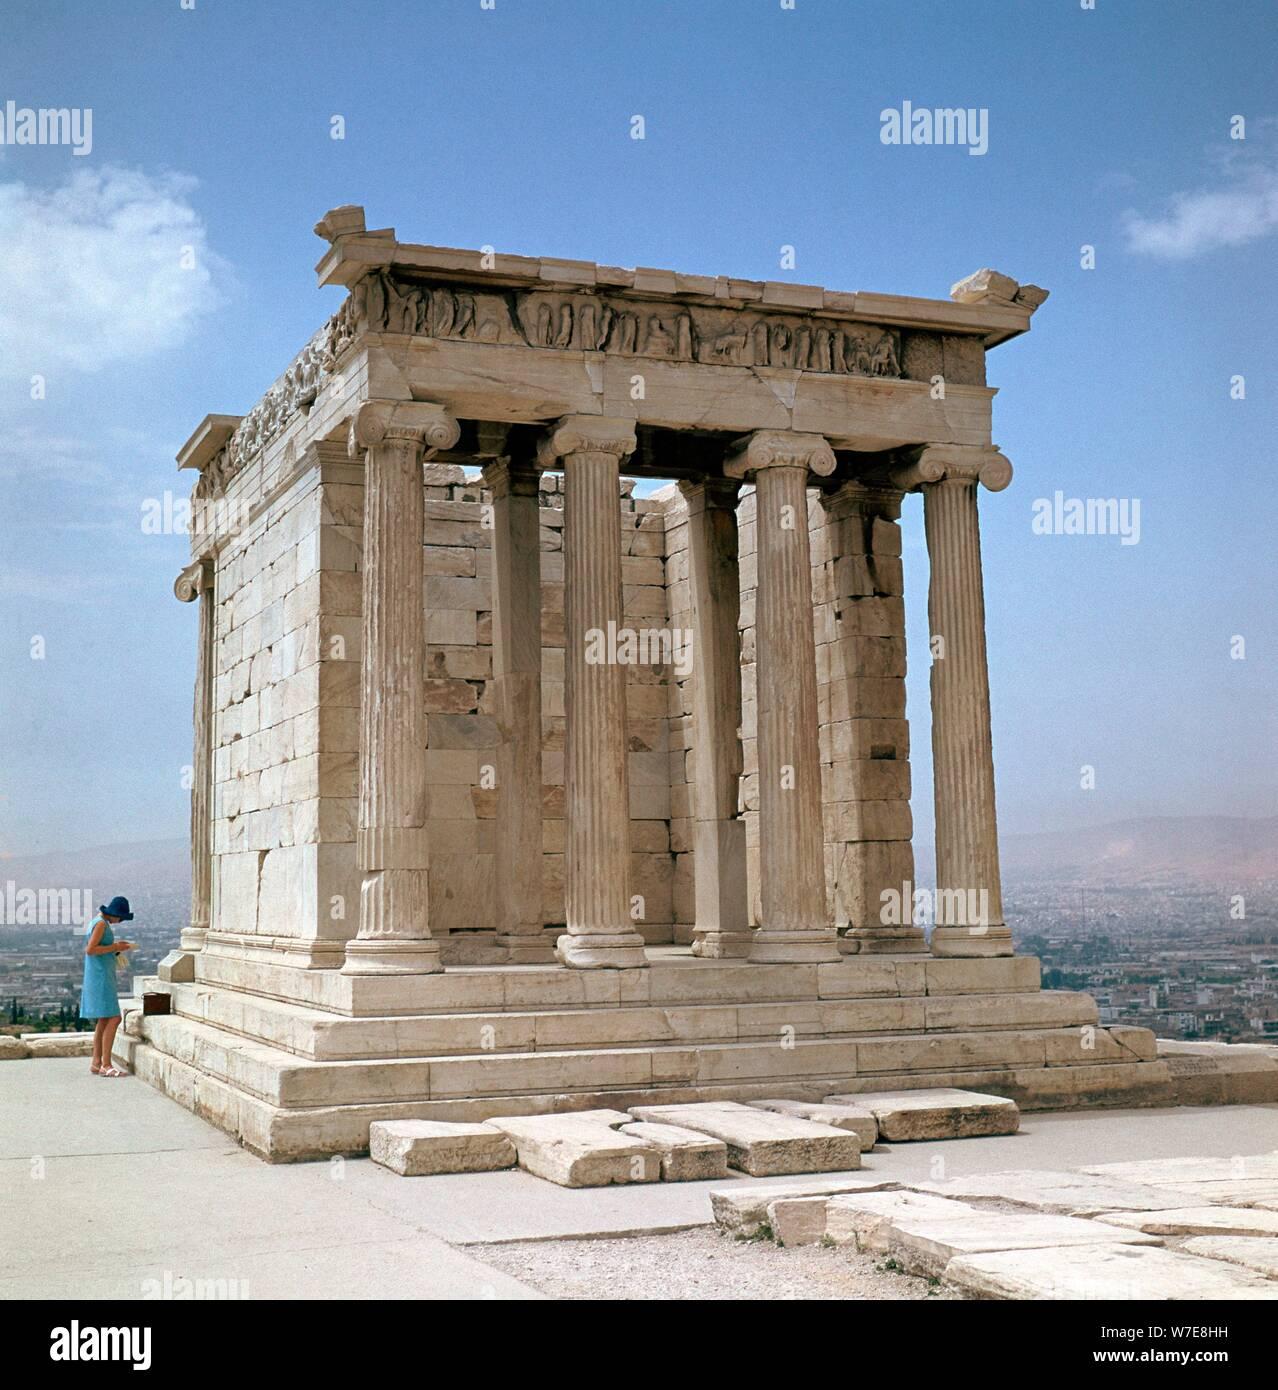 Temple Athena Imágenes Stockamp; De Fotos Nike RLq5A34j